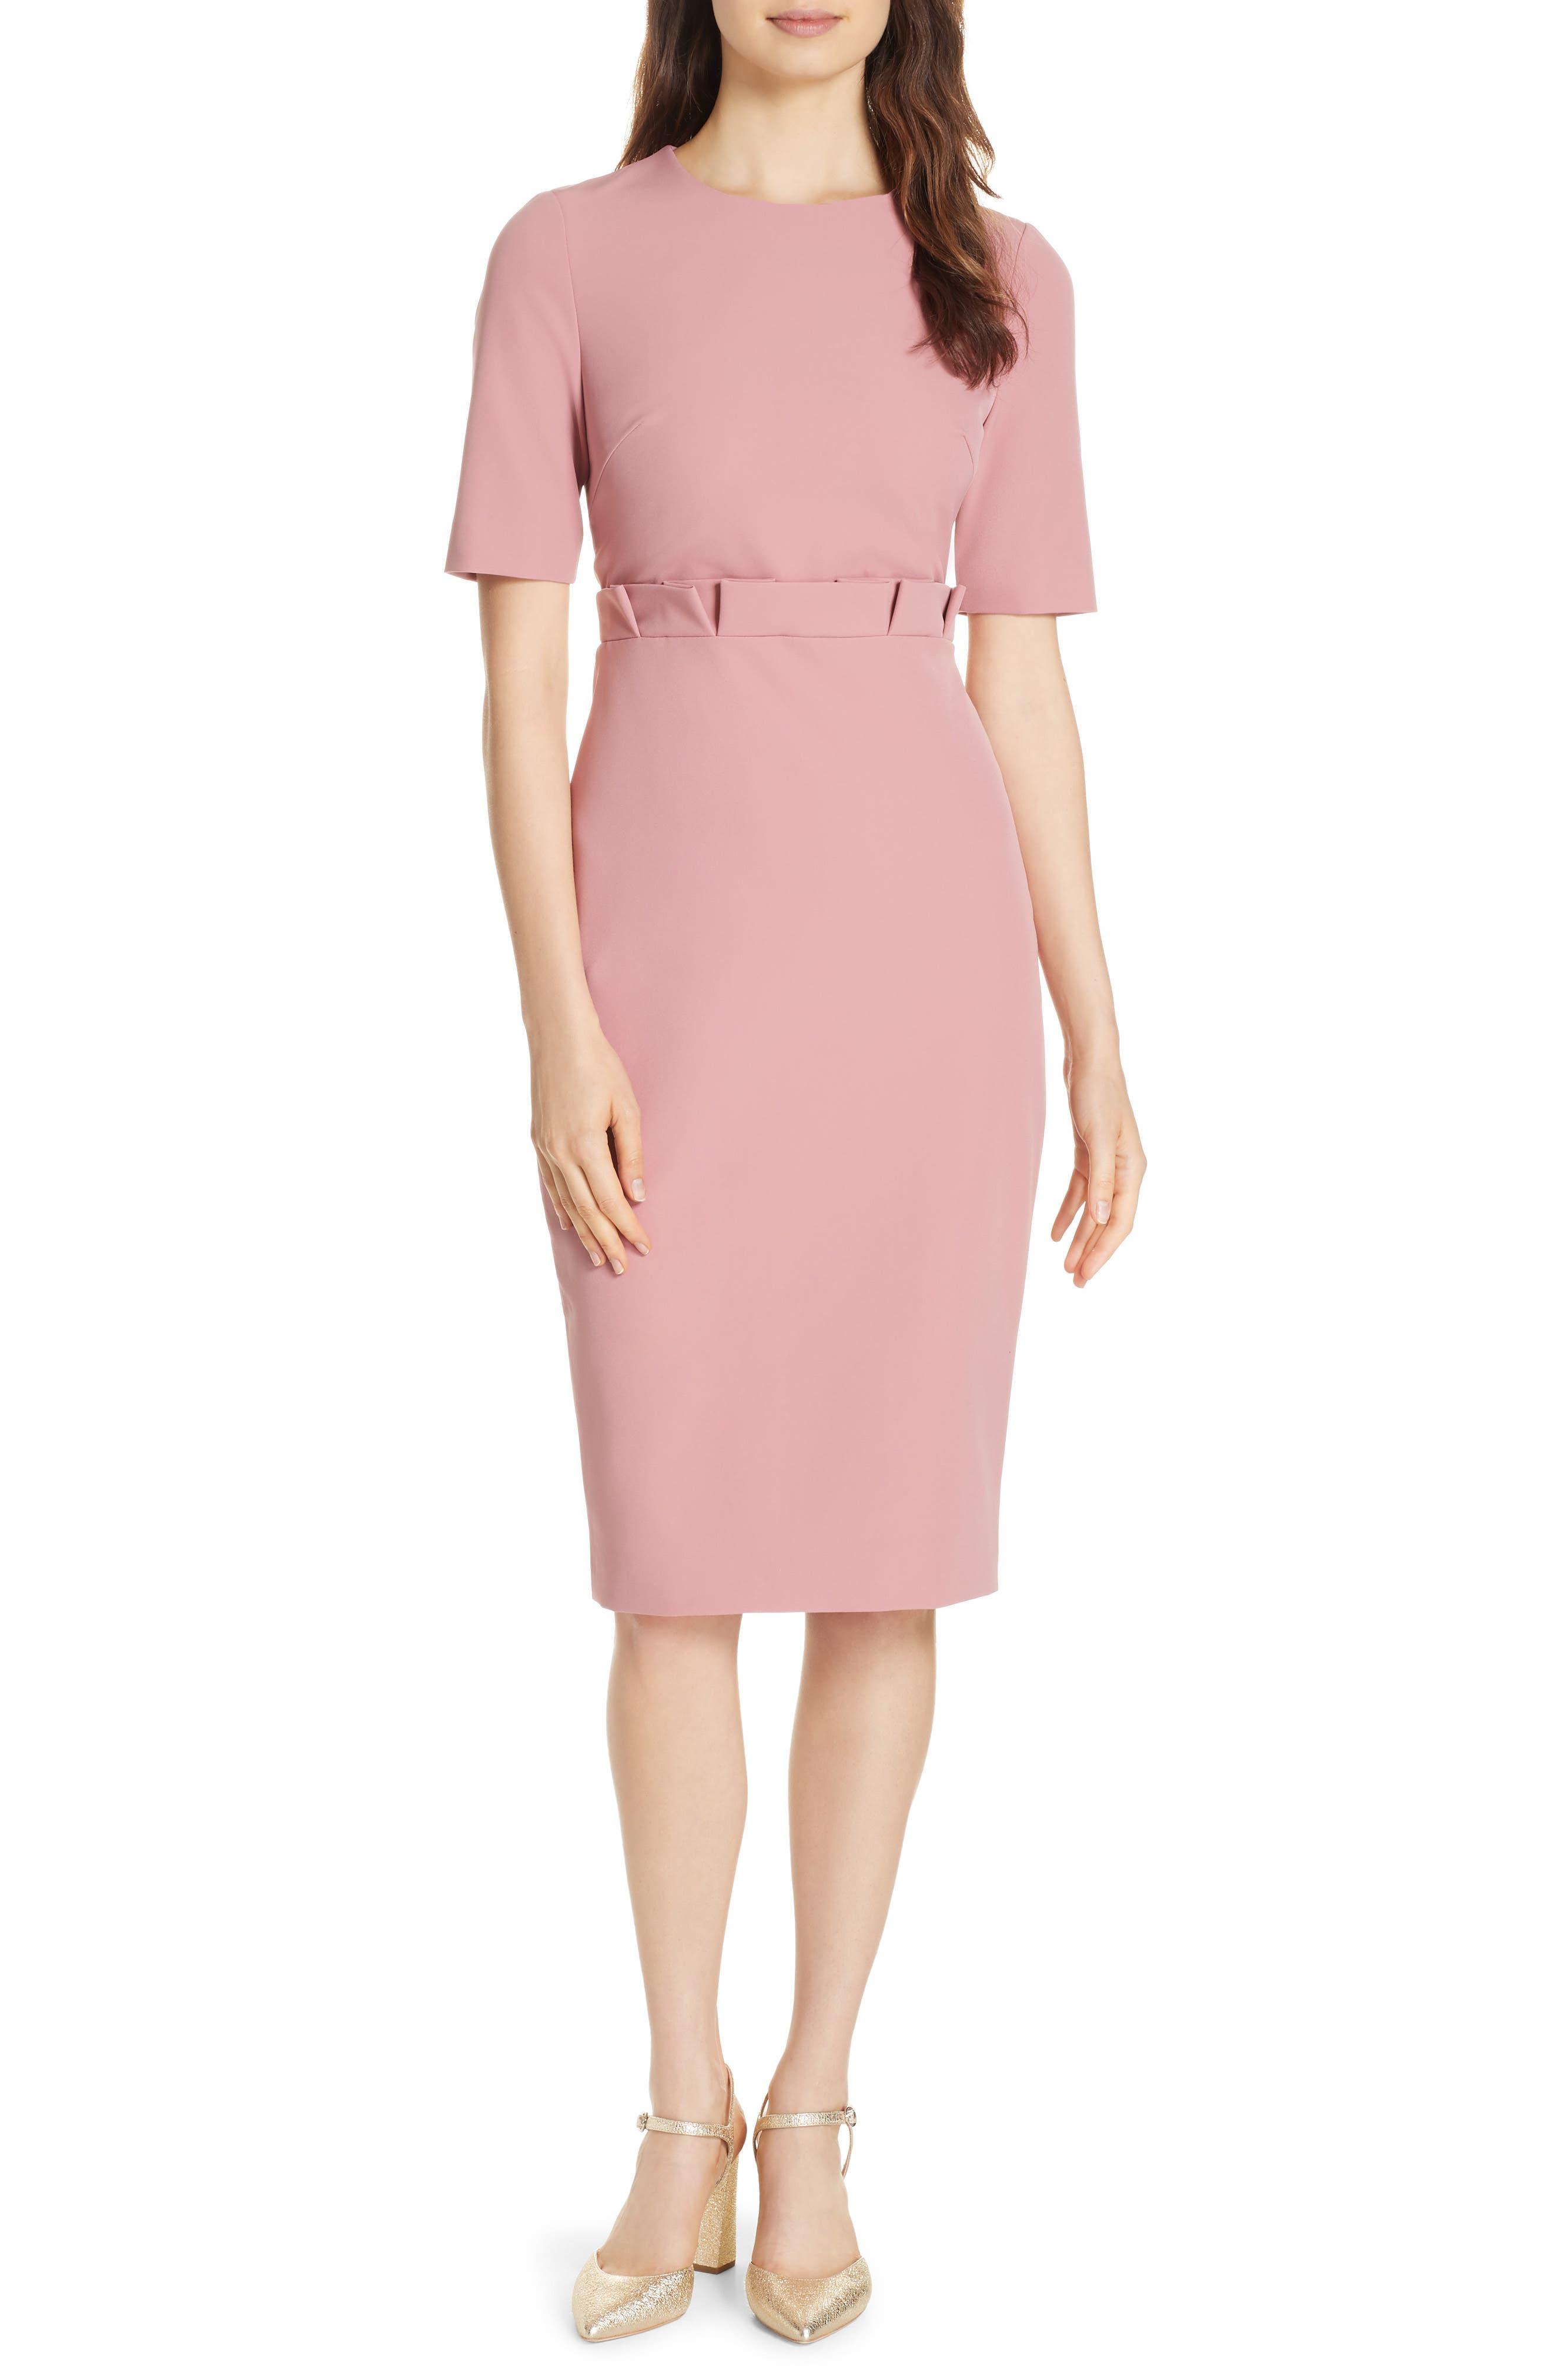 Maggidd Ruffle Waist Pencil Dress,                         Main,                         color, 953